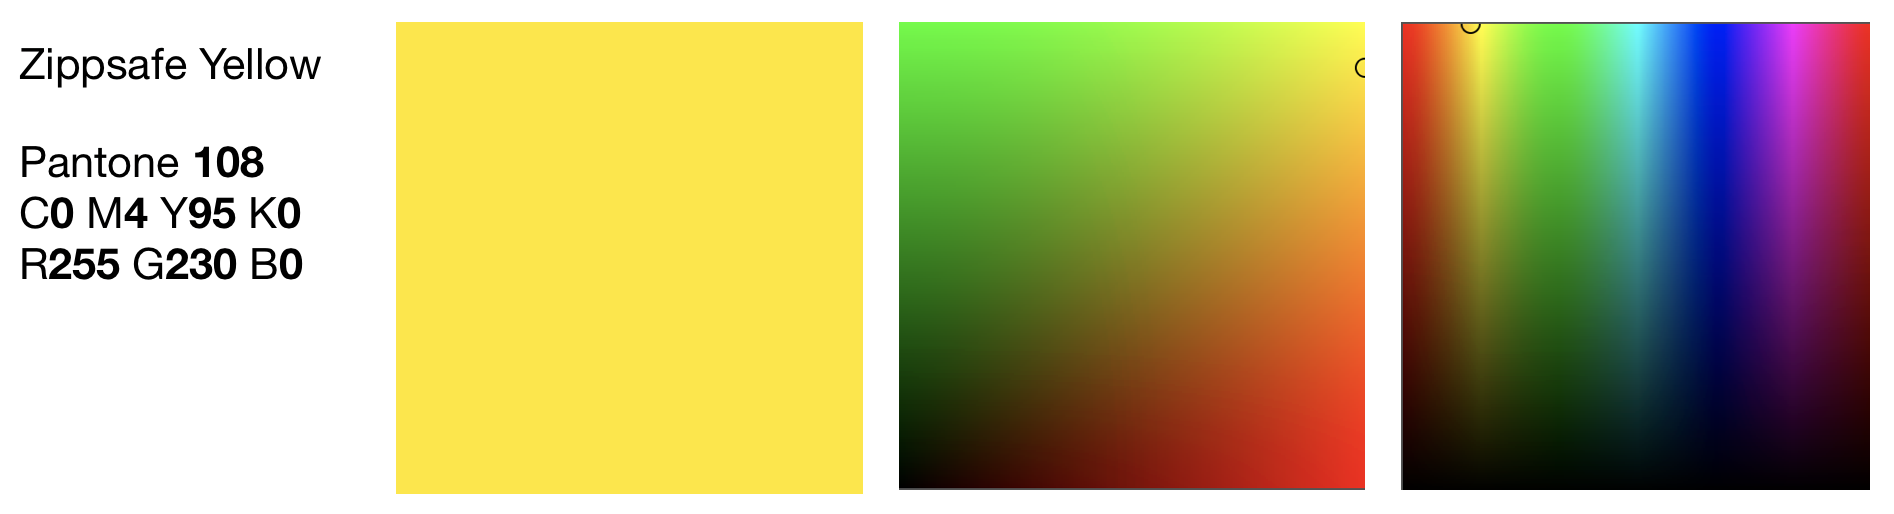 zippsafe-final-color